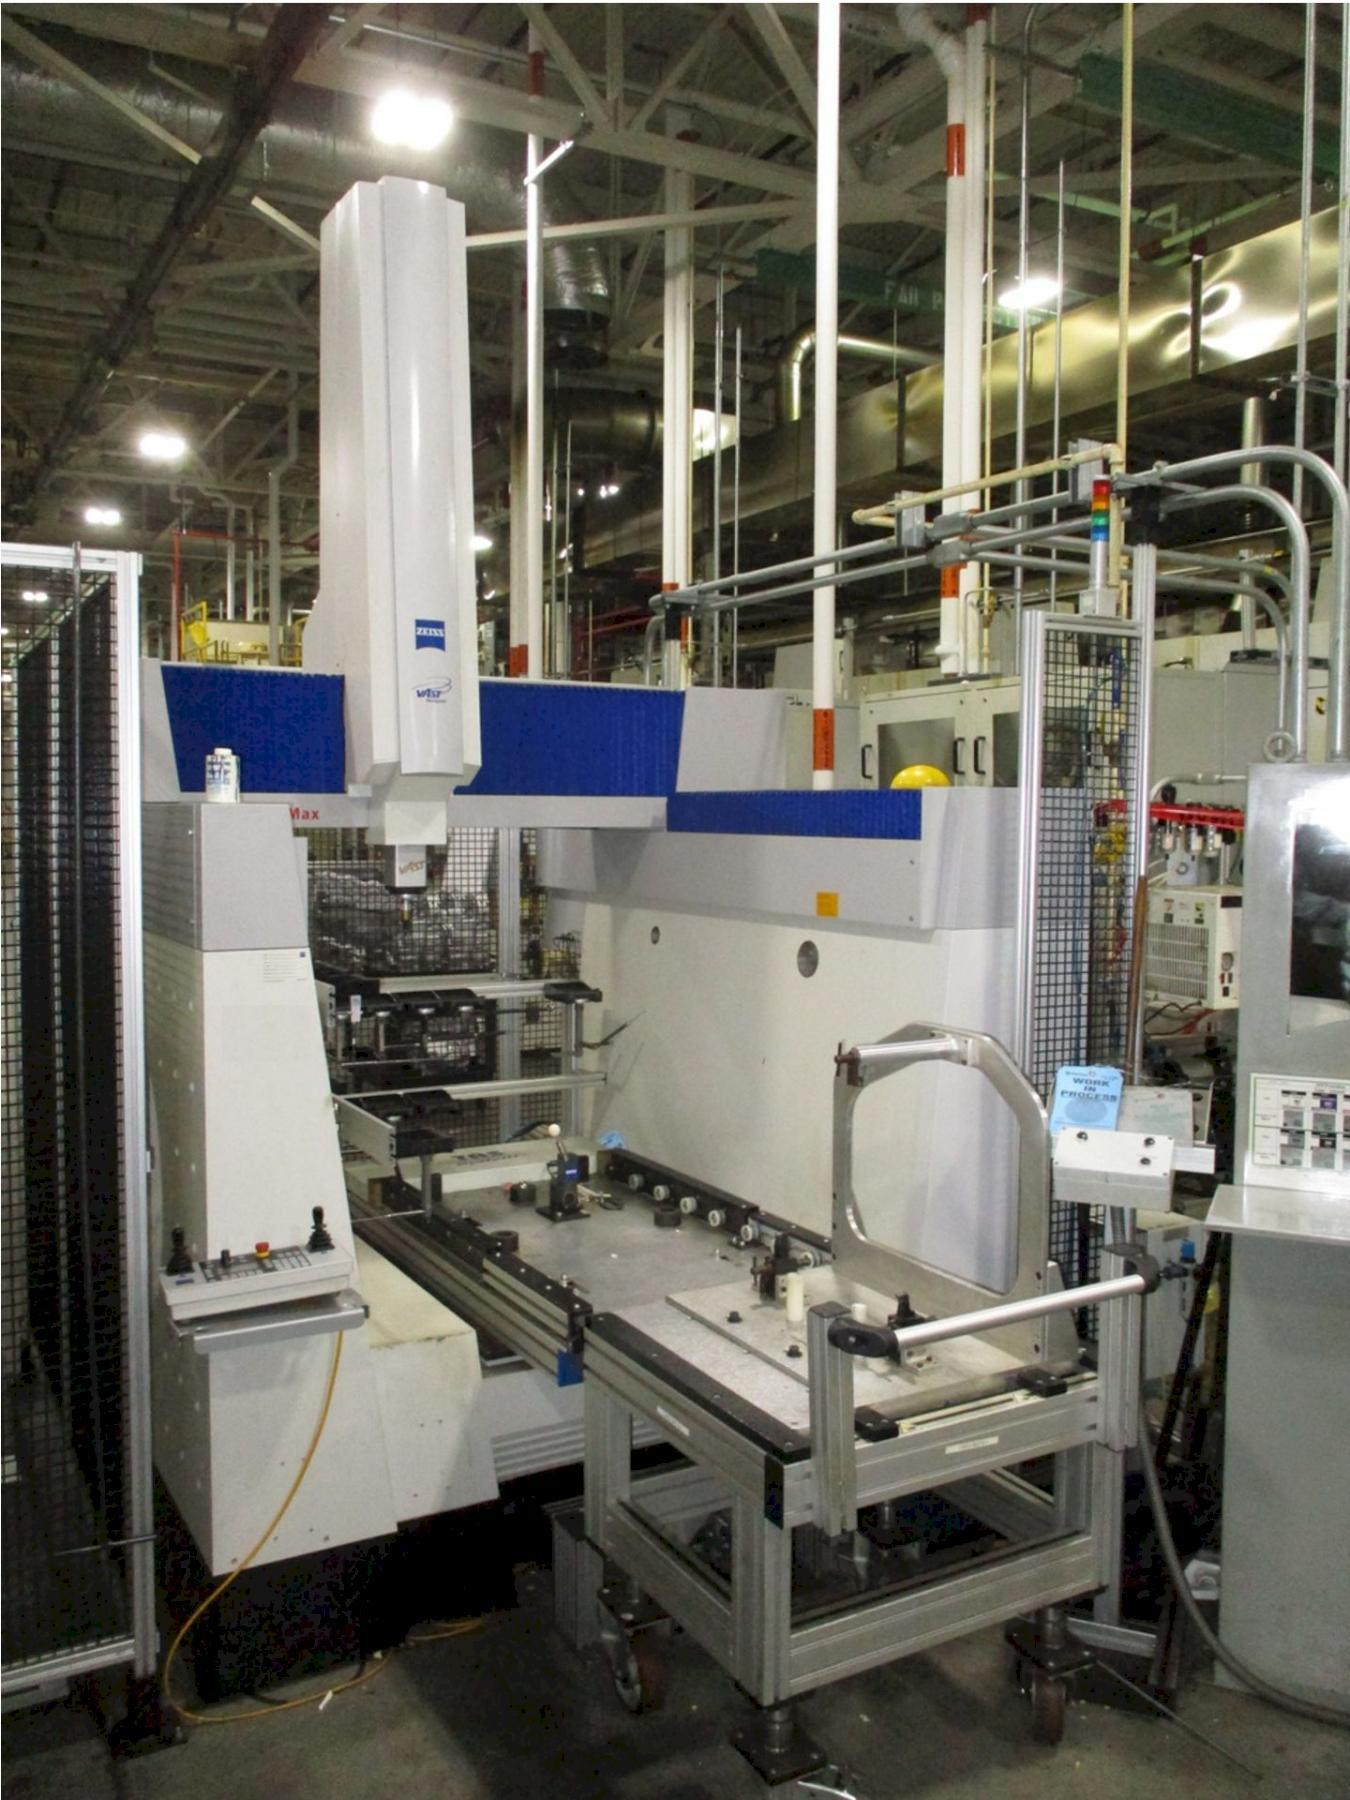 Zeiss Centermax Navigator11/12/9 Coordinate Measuring Machine (CMM)(#33230)